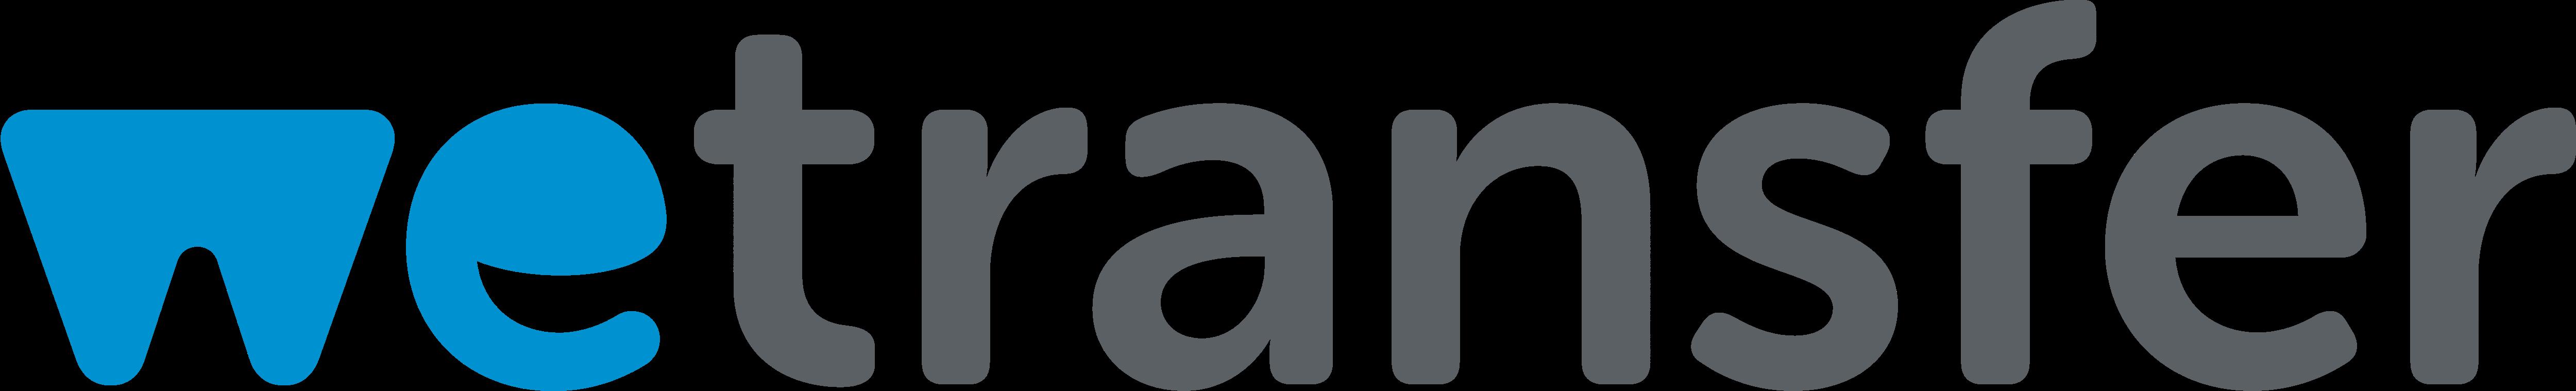 WeTransfer (We Transfer) – Logos Download